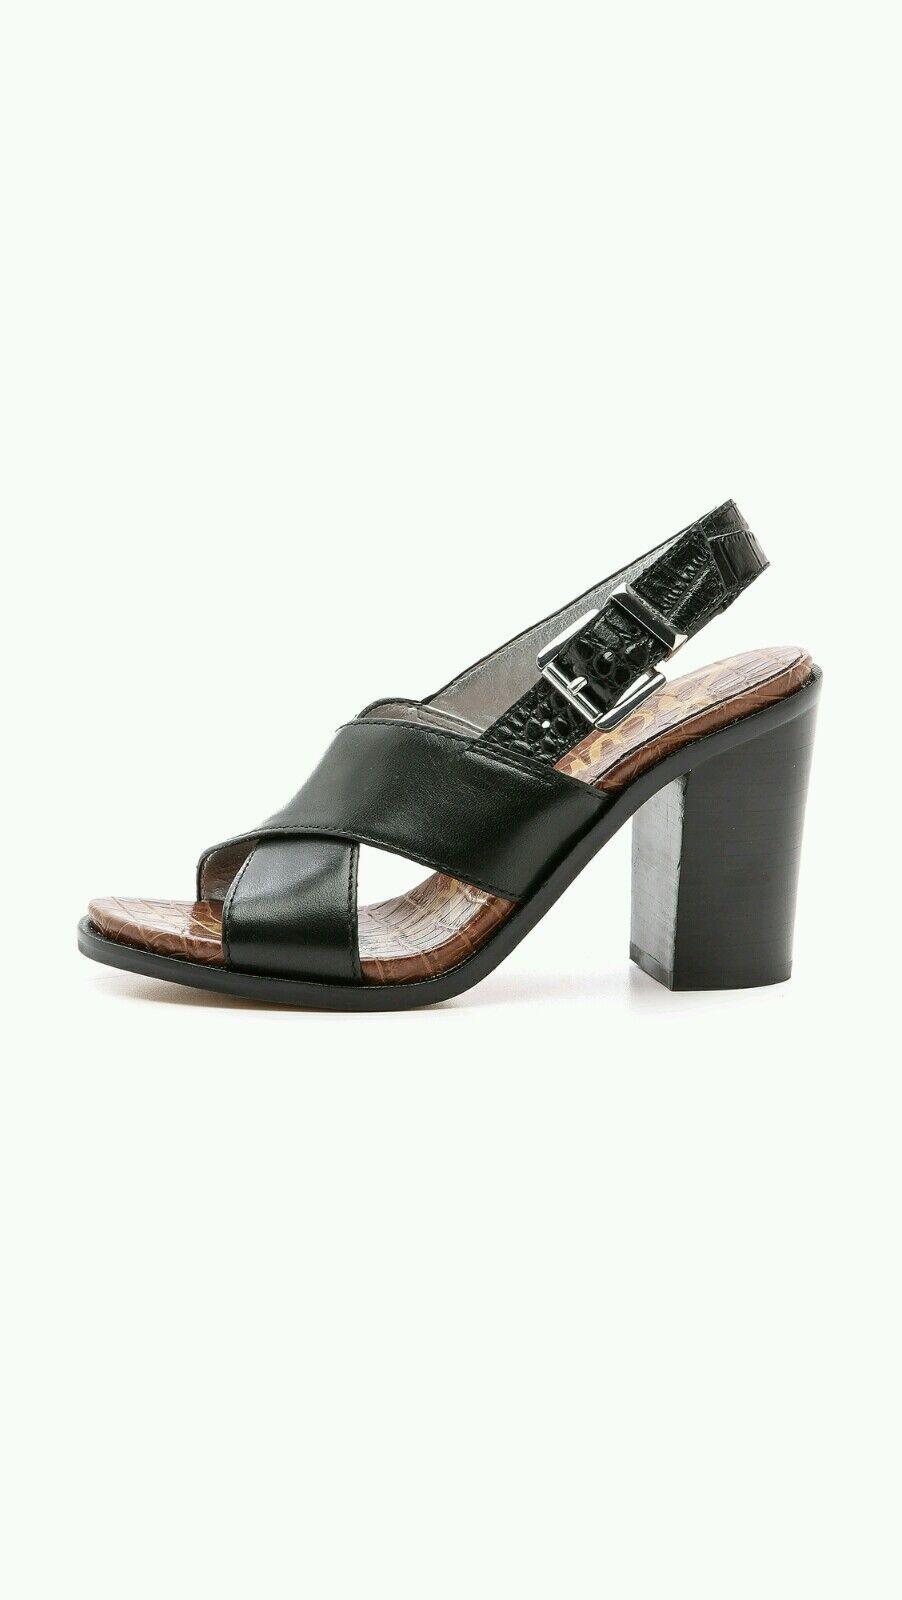 Sam Edelman Ivy nero Leather Sandal Crisscross Slingback Chunky Heel Dimensione 9.5